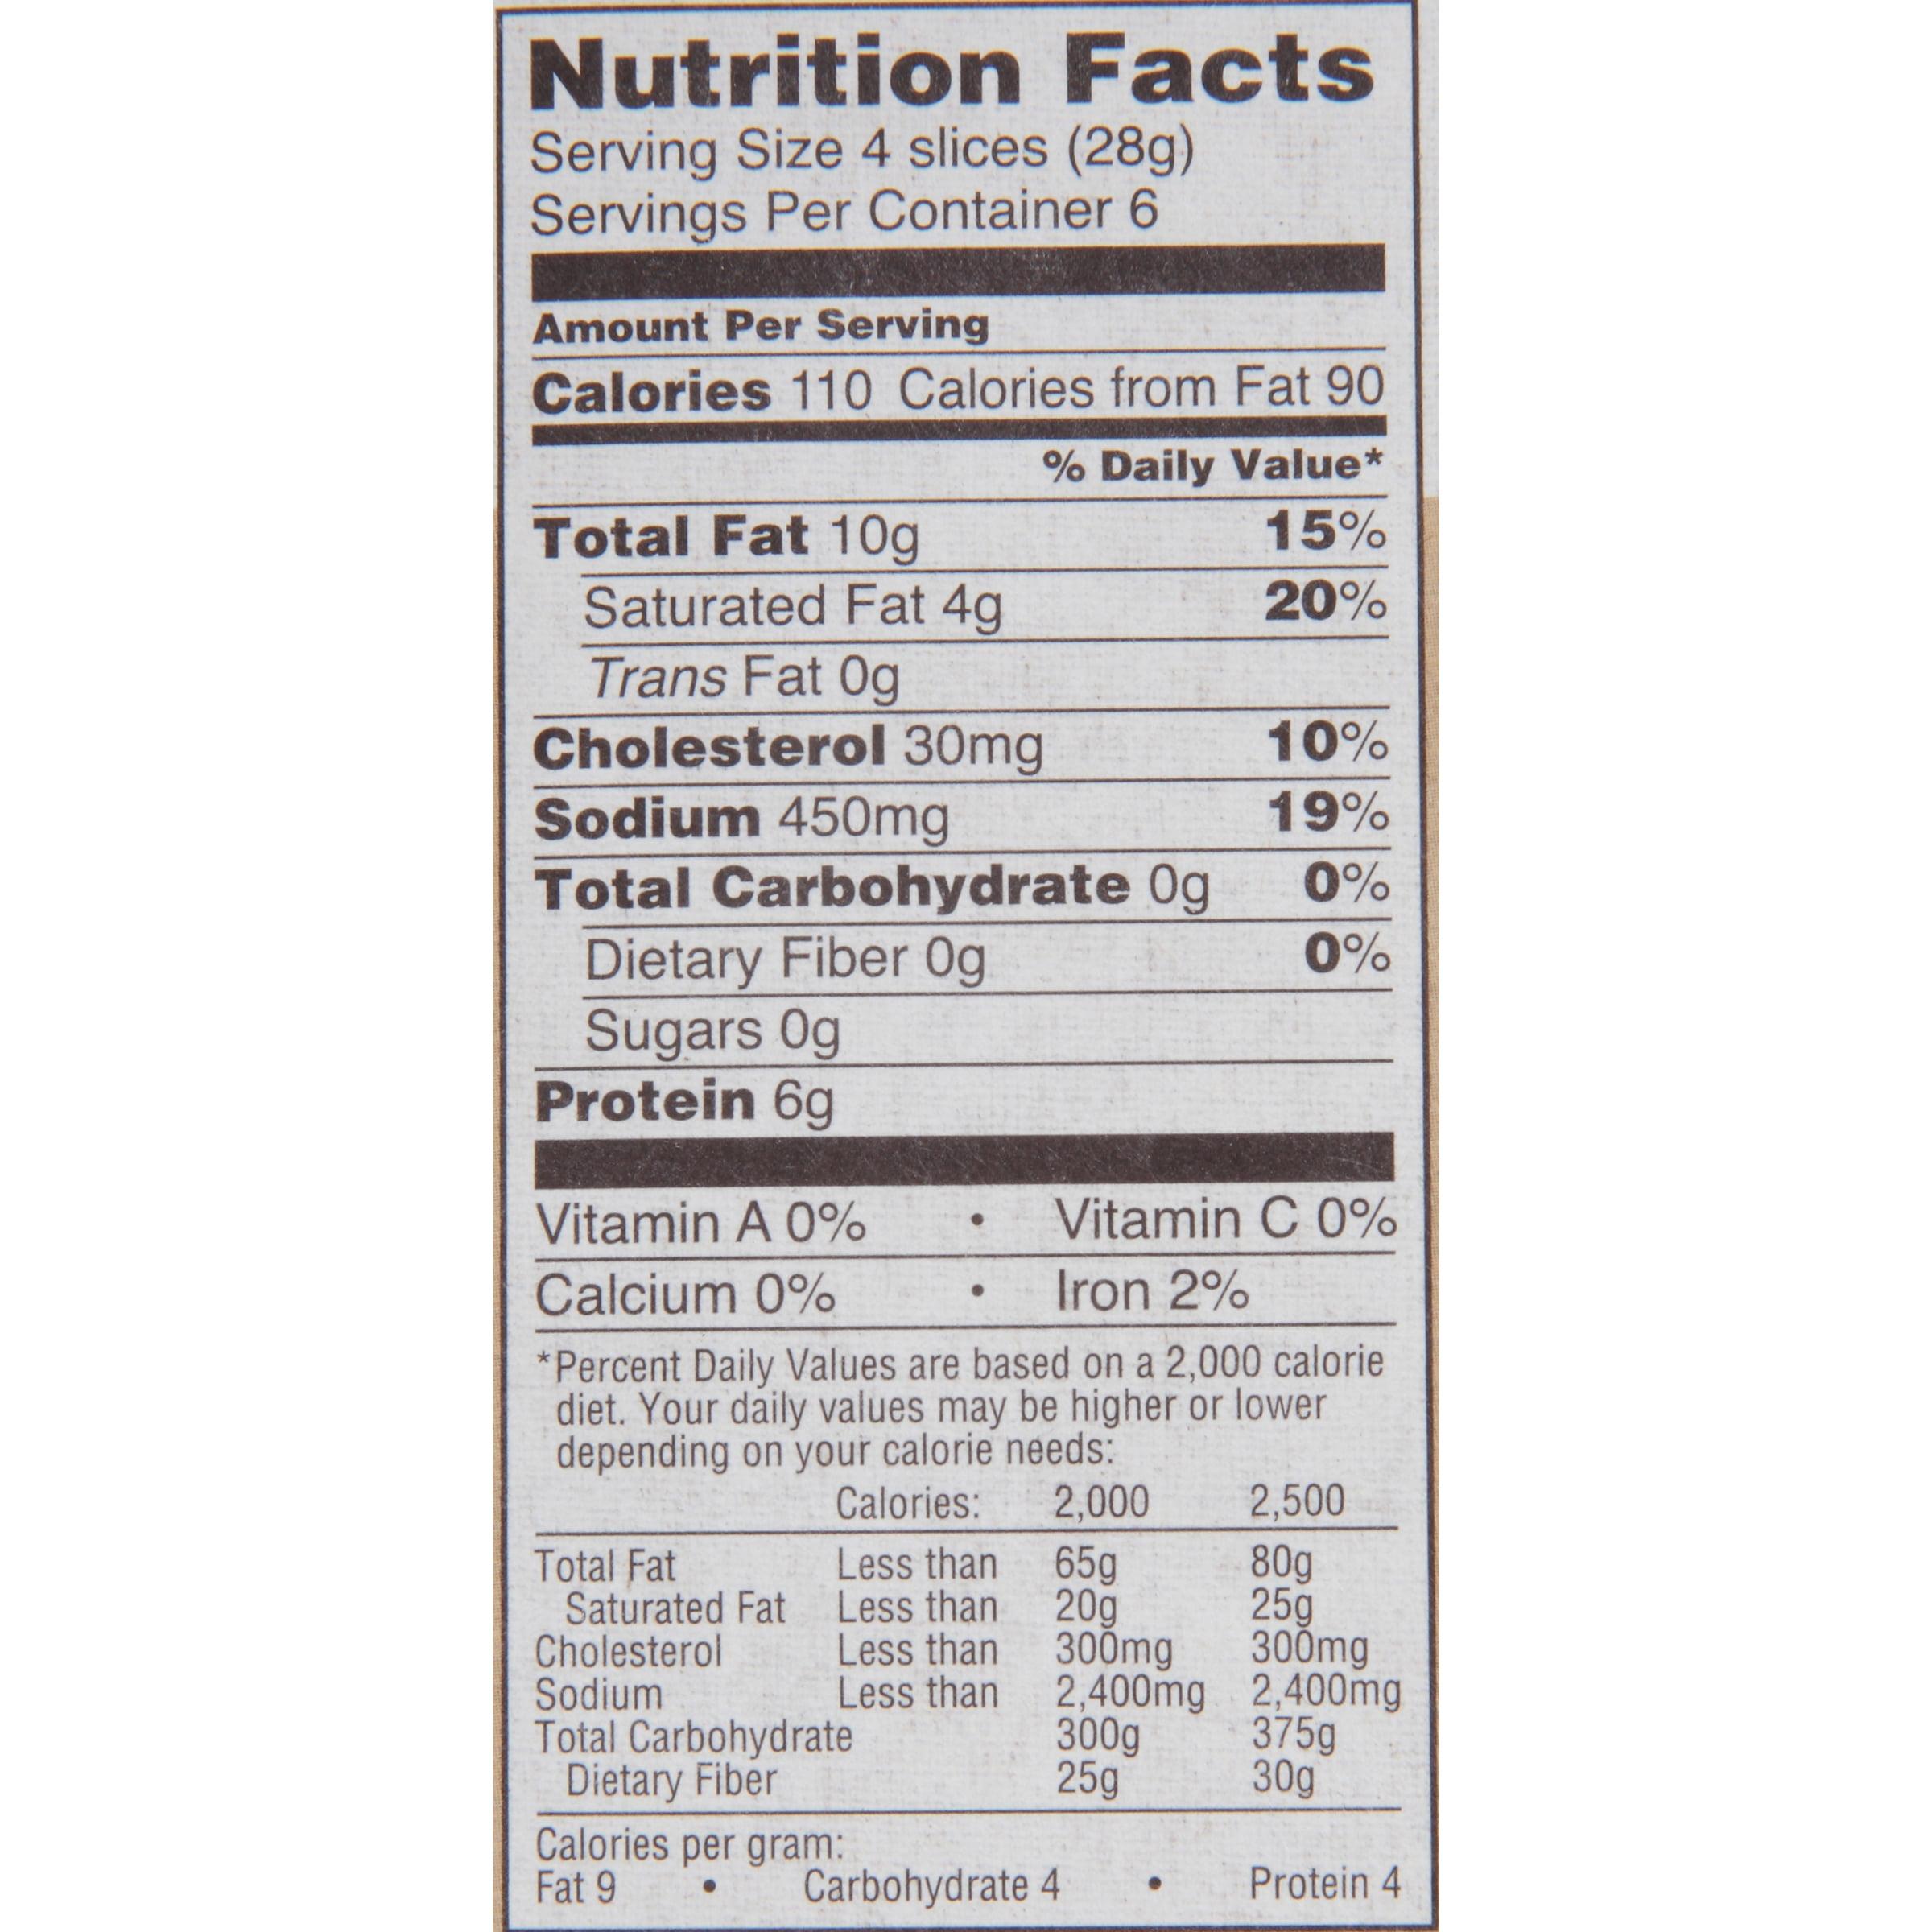 Eckrich Salami Nutrition Facts